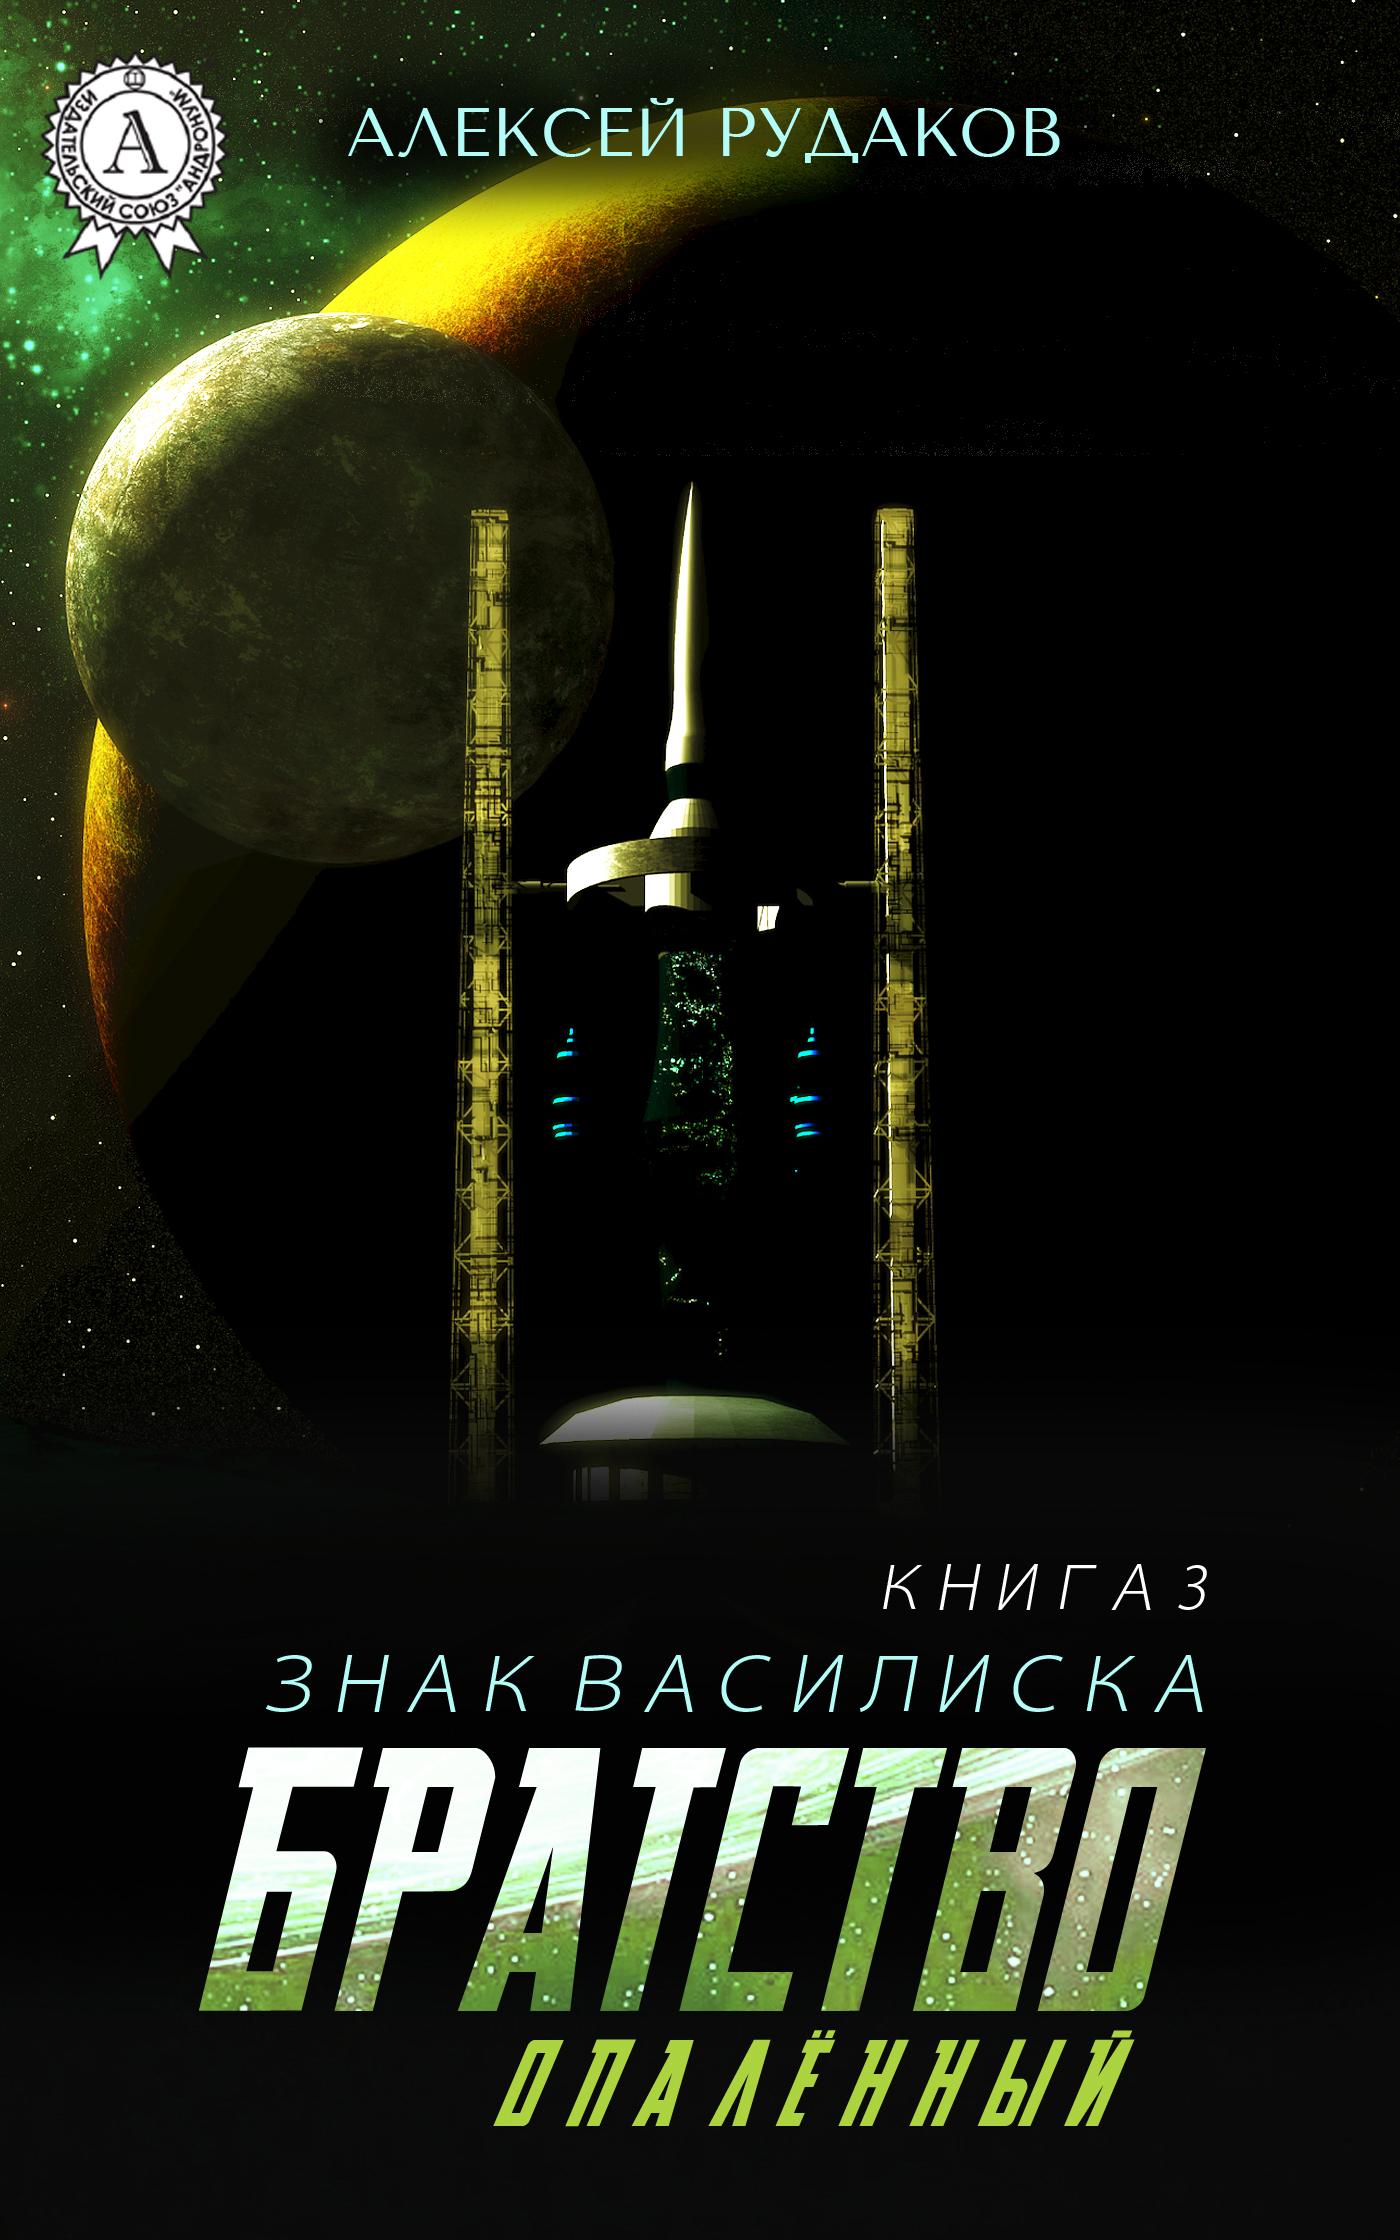 Алексей Рудаков бесплатно